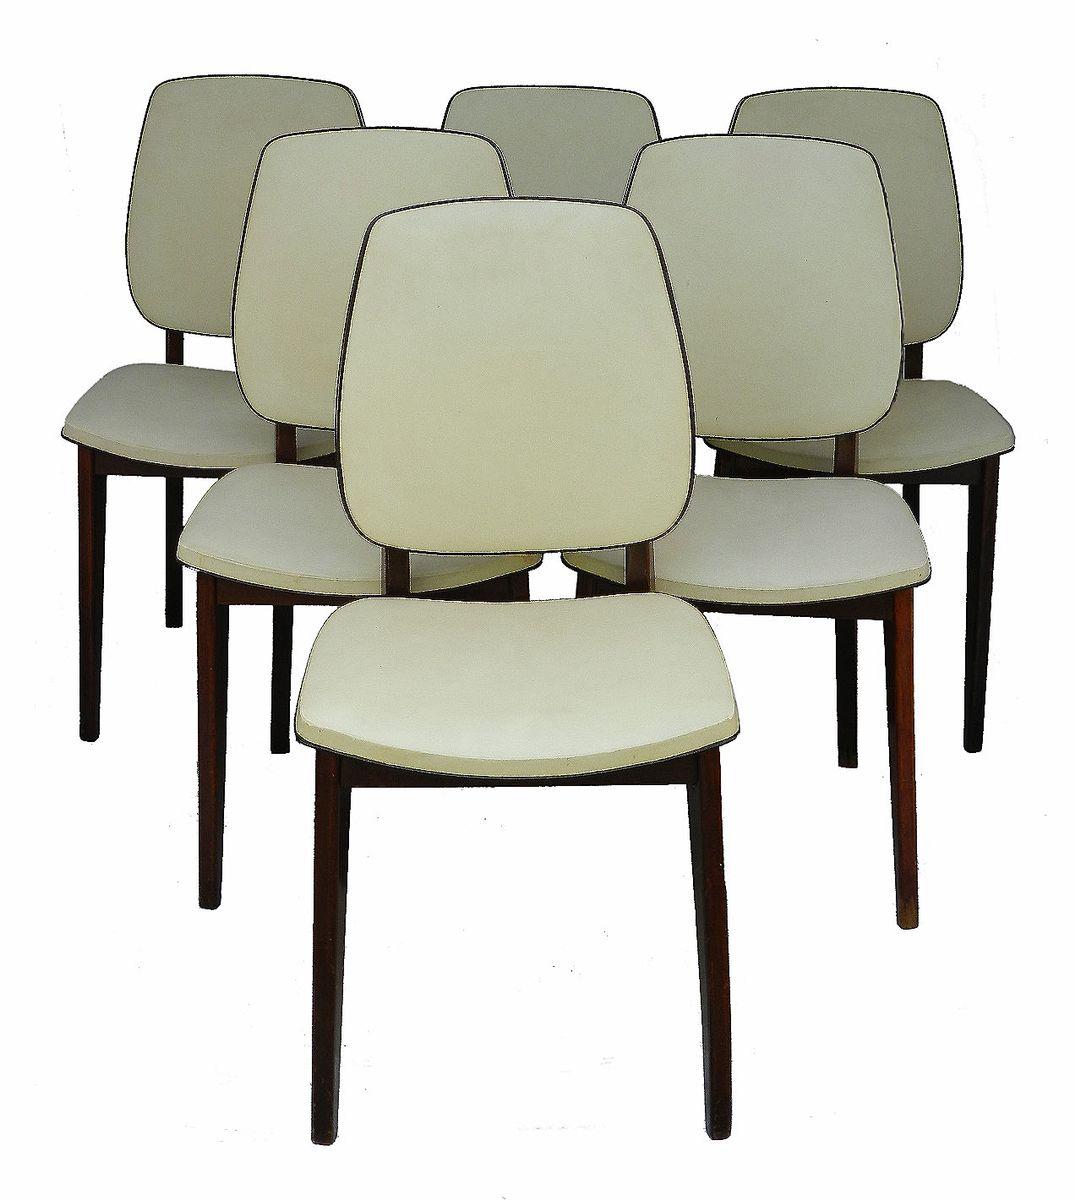 franz sische mid century esszimmerst hle 6er set bei. Black Bedroom Furniture Sets. Home Design Ideas